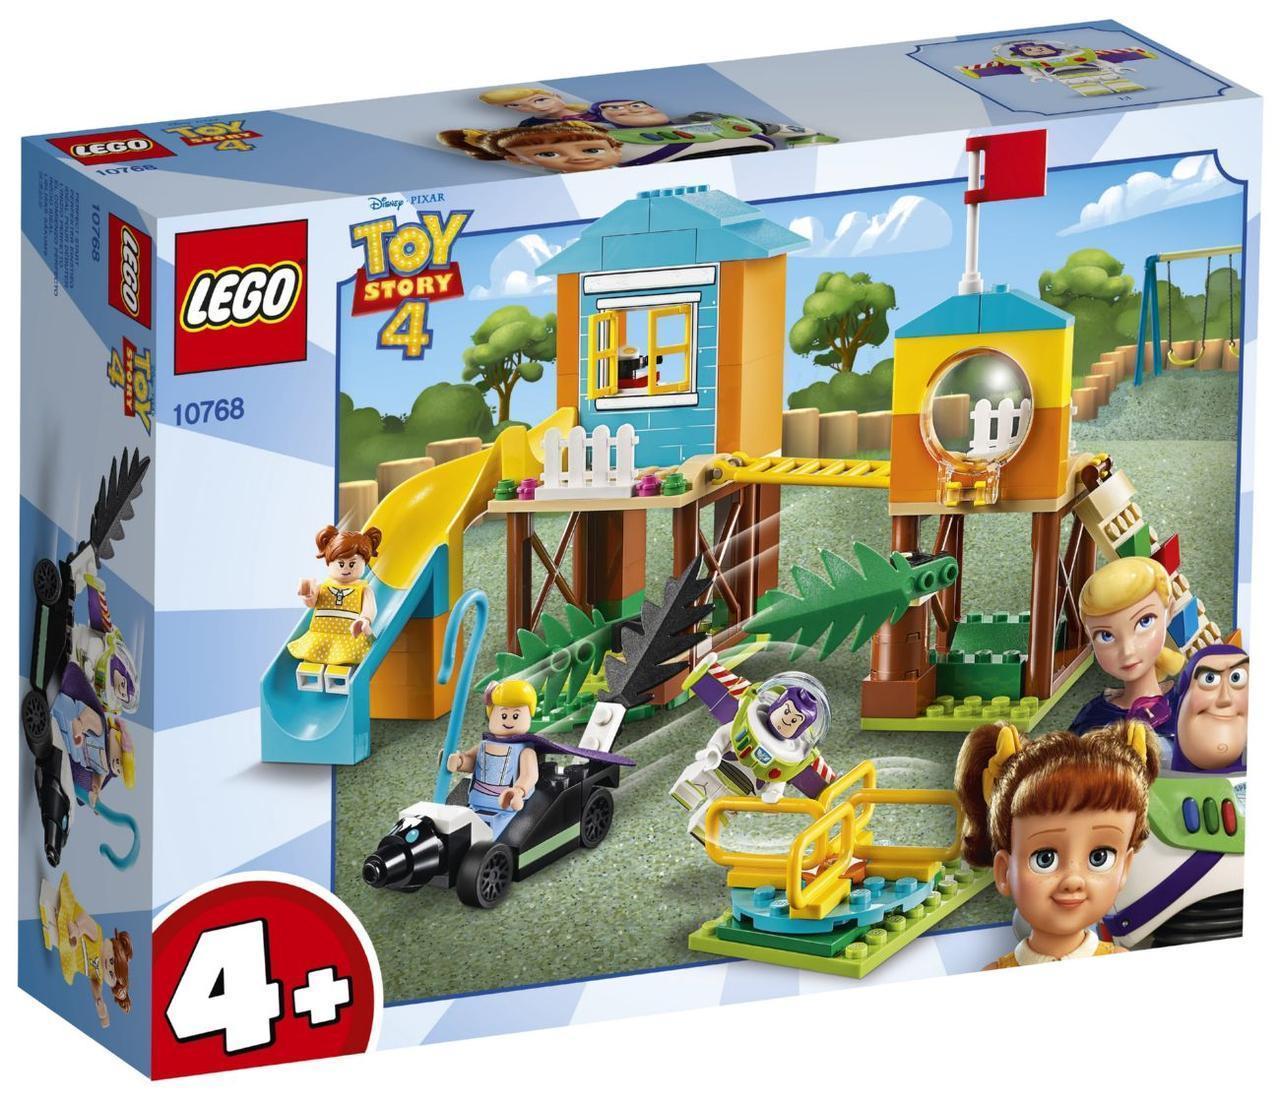 Lego Toy Story 4 Приключения Базза и Бо Пип на детской площадке 10768